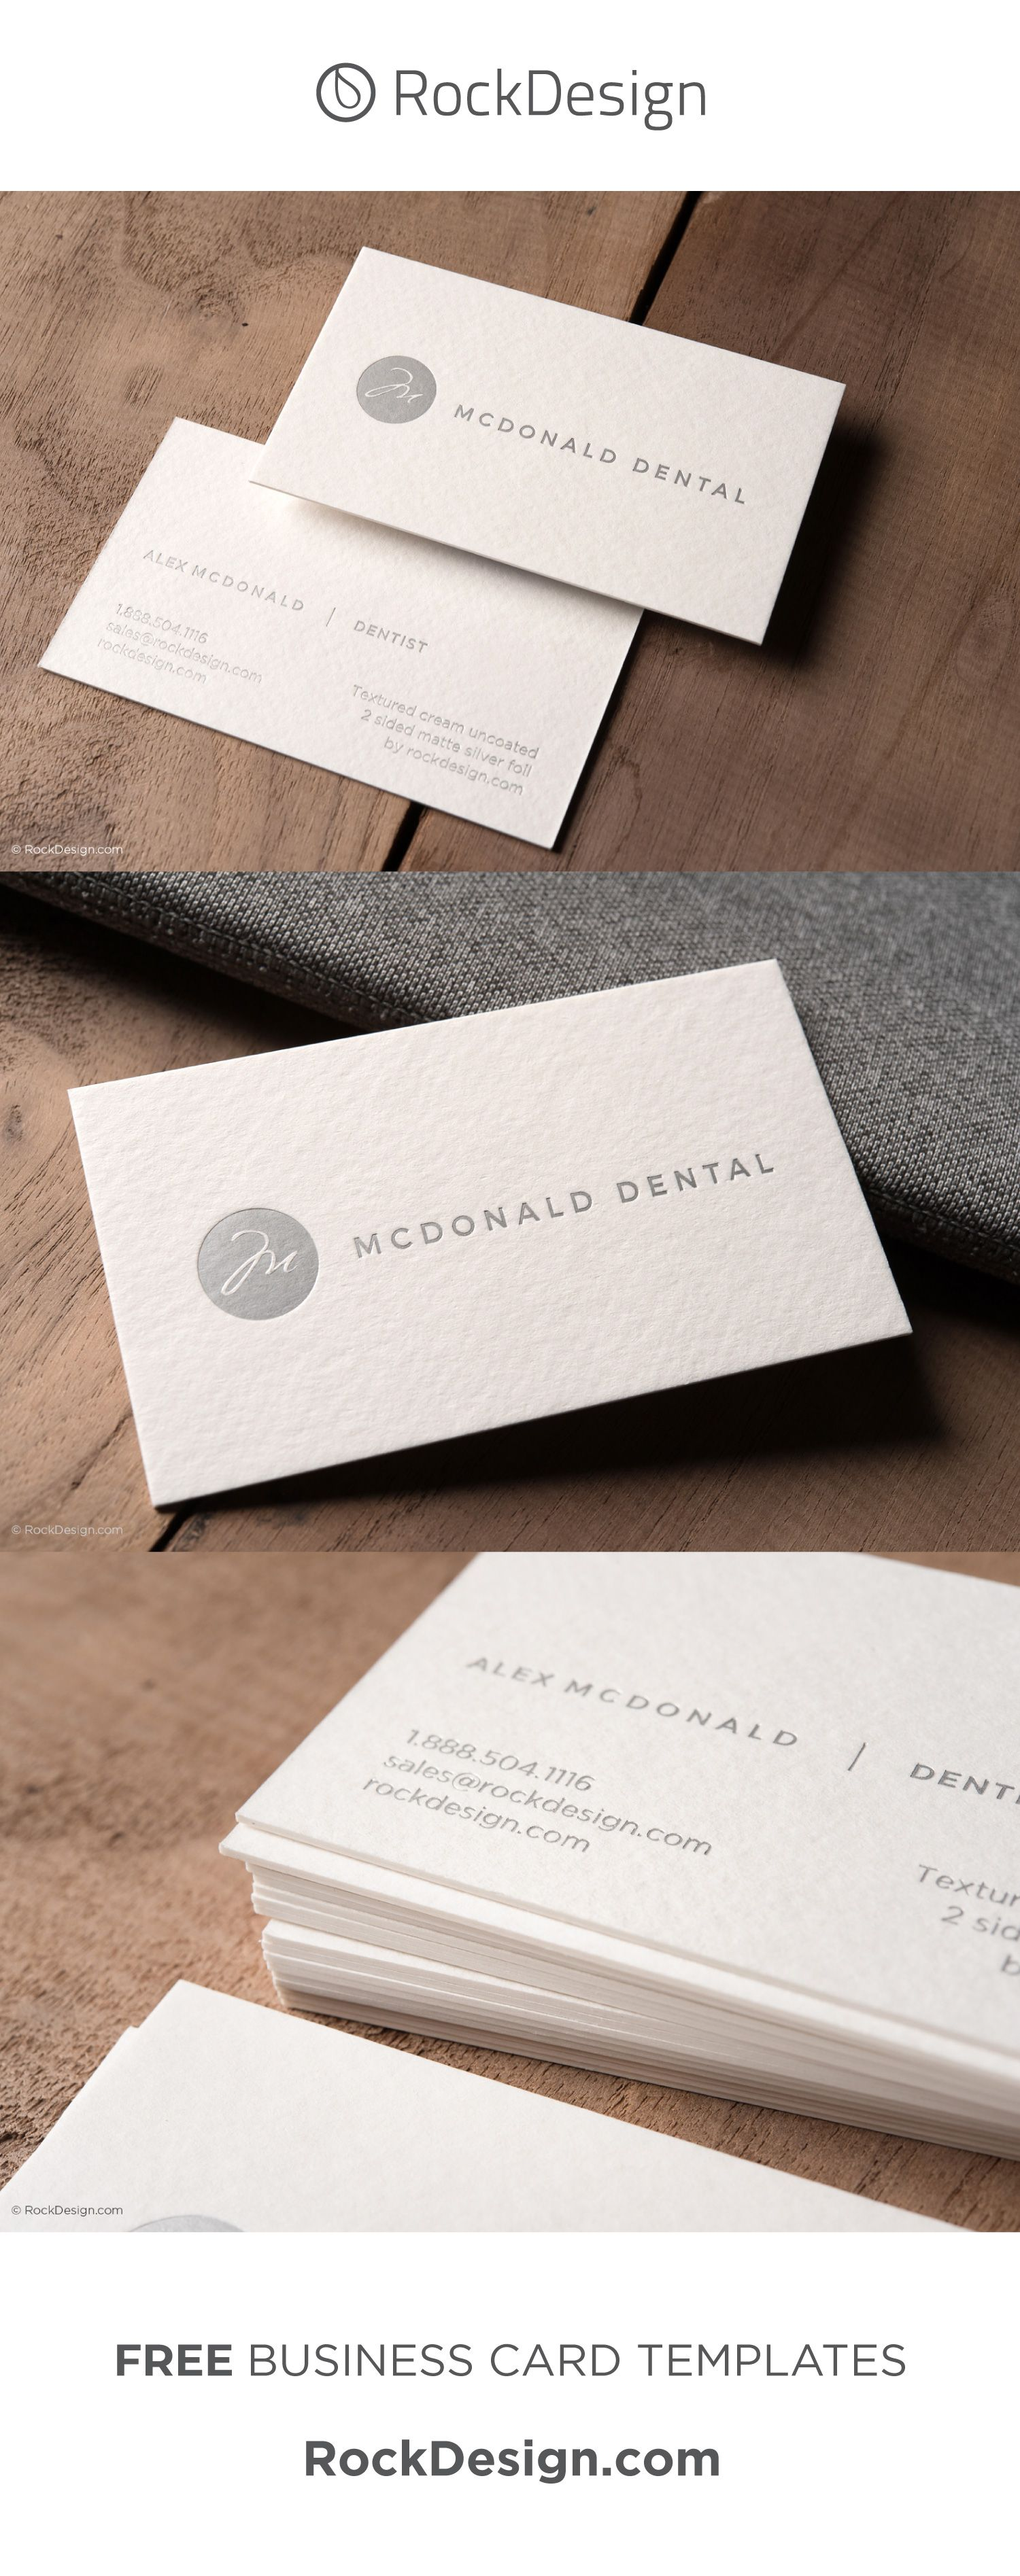 Modern Minimalist Textured Cream Business Card With Silver Foil Mcdonald Dental Dental Business Cards Minimalist Business Cards Cool Business Cards